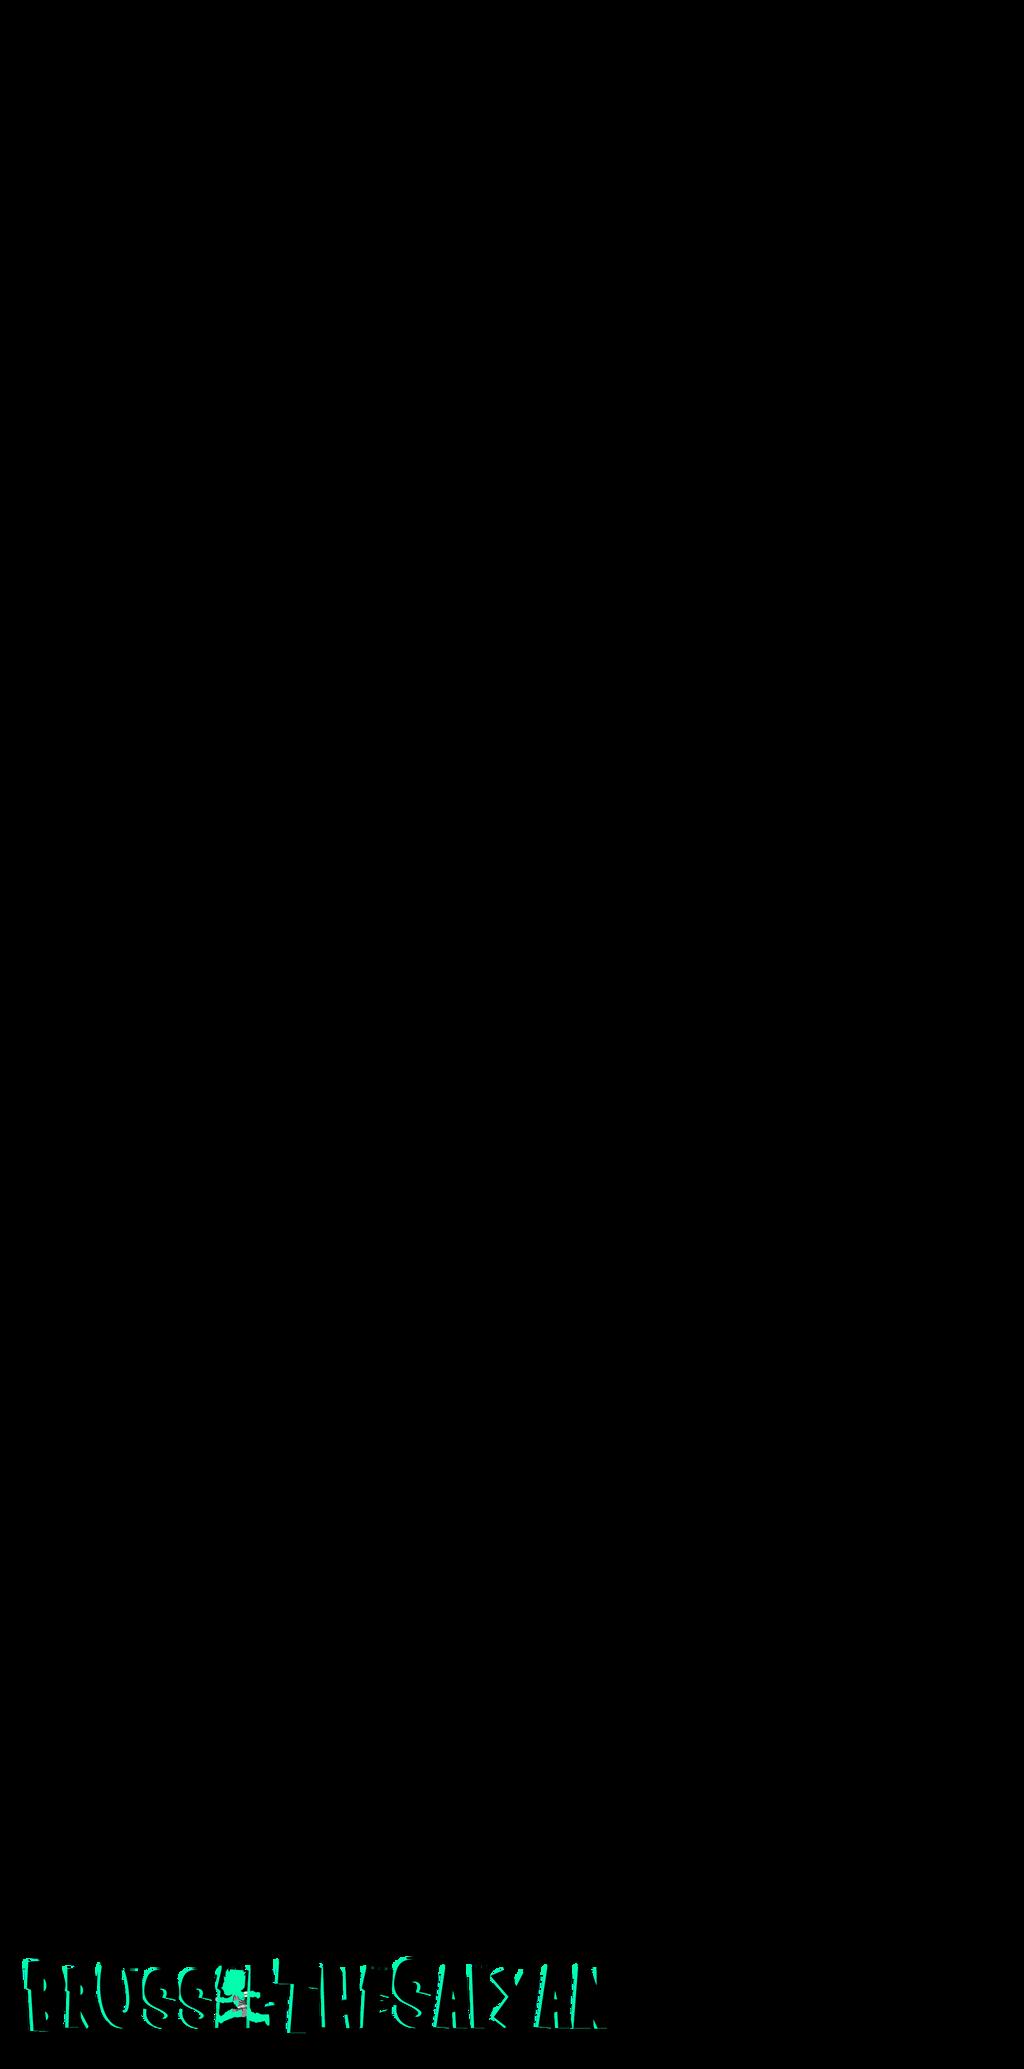 Super Saiyan Goku Version 4 Lineart